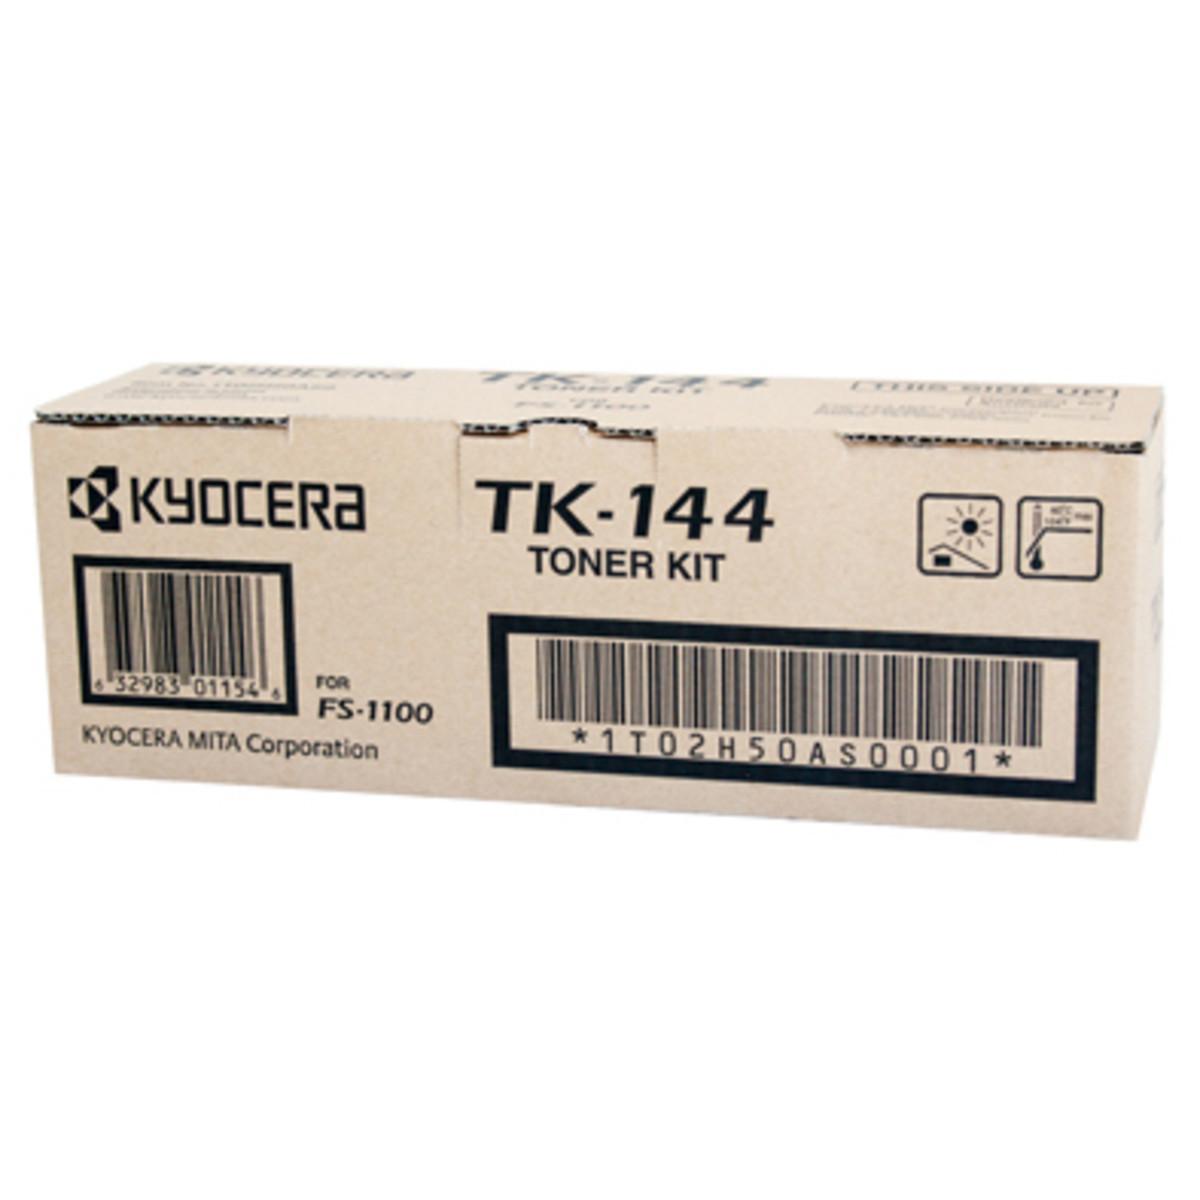 Kyocera TK-144 Black Toner Cartridge